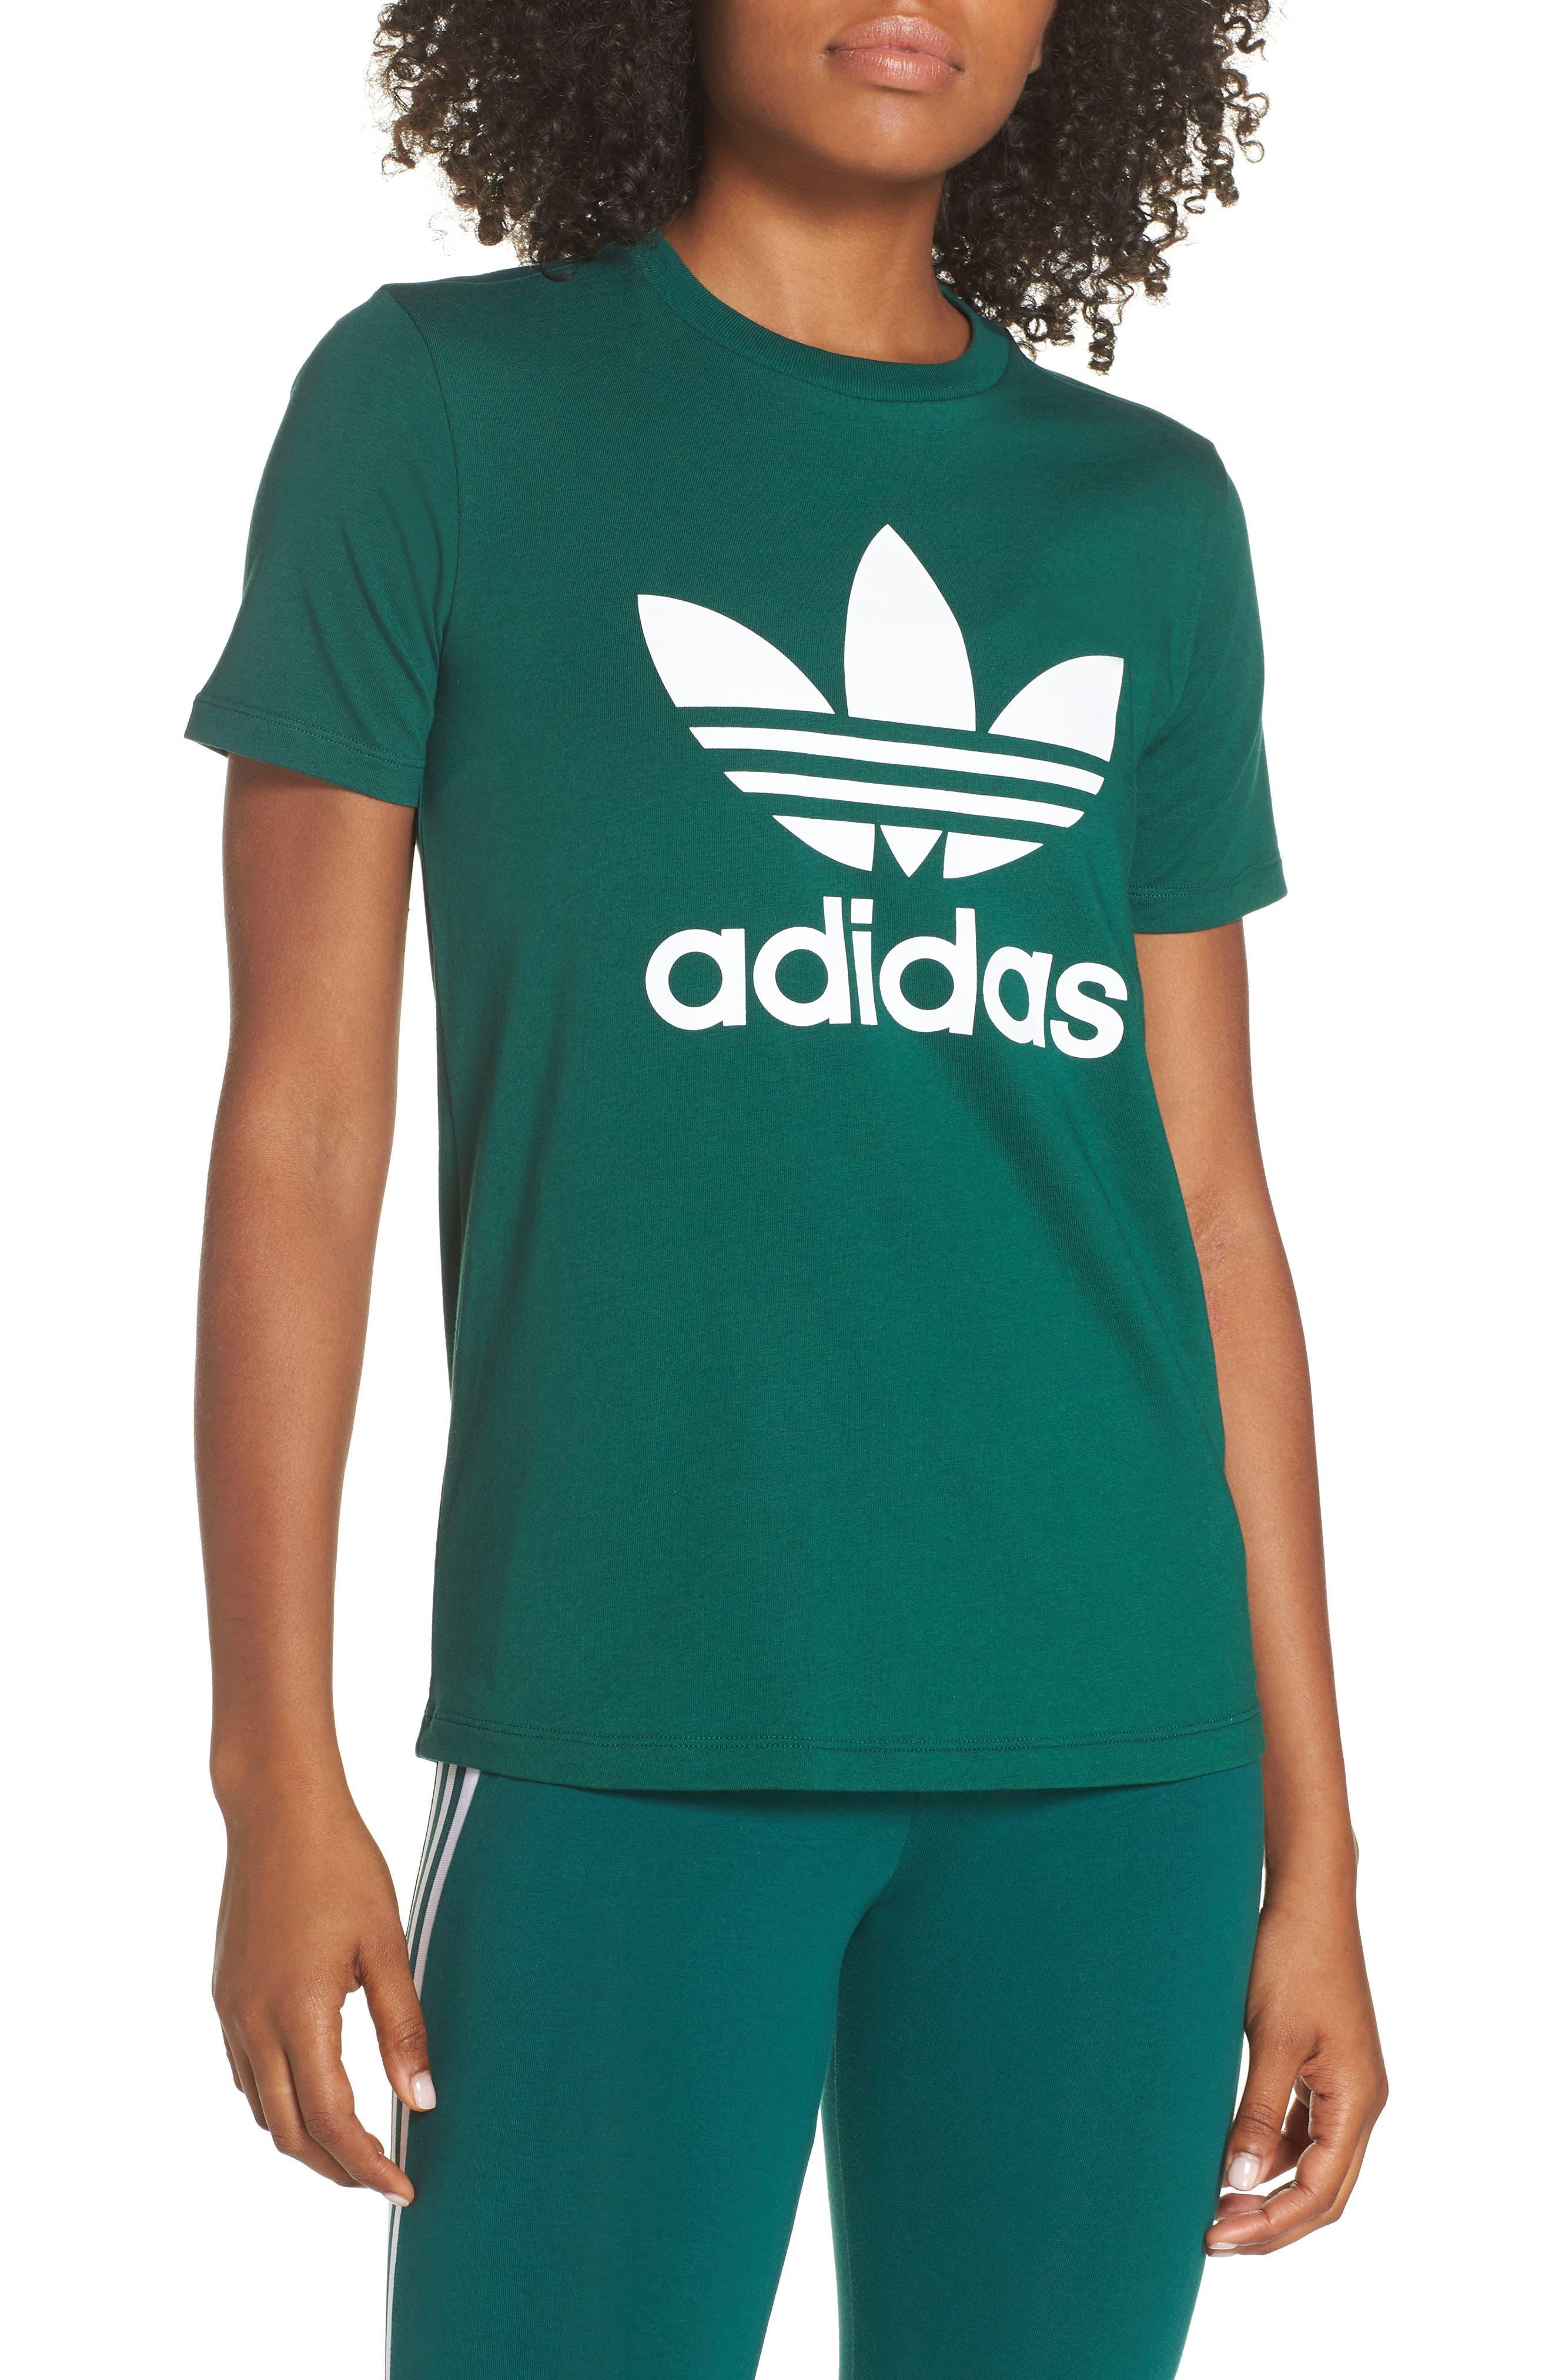 adidas Trefoil Tee,                             Main thumbnail 1, color,                             COLLEGIATE GREEN